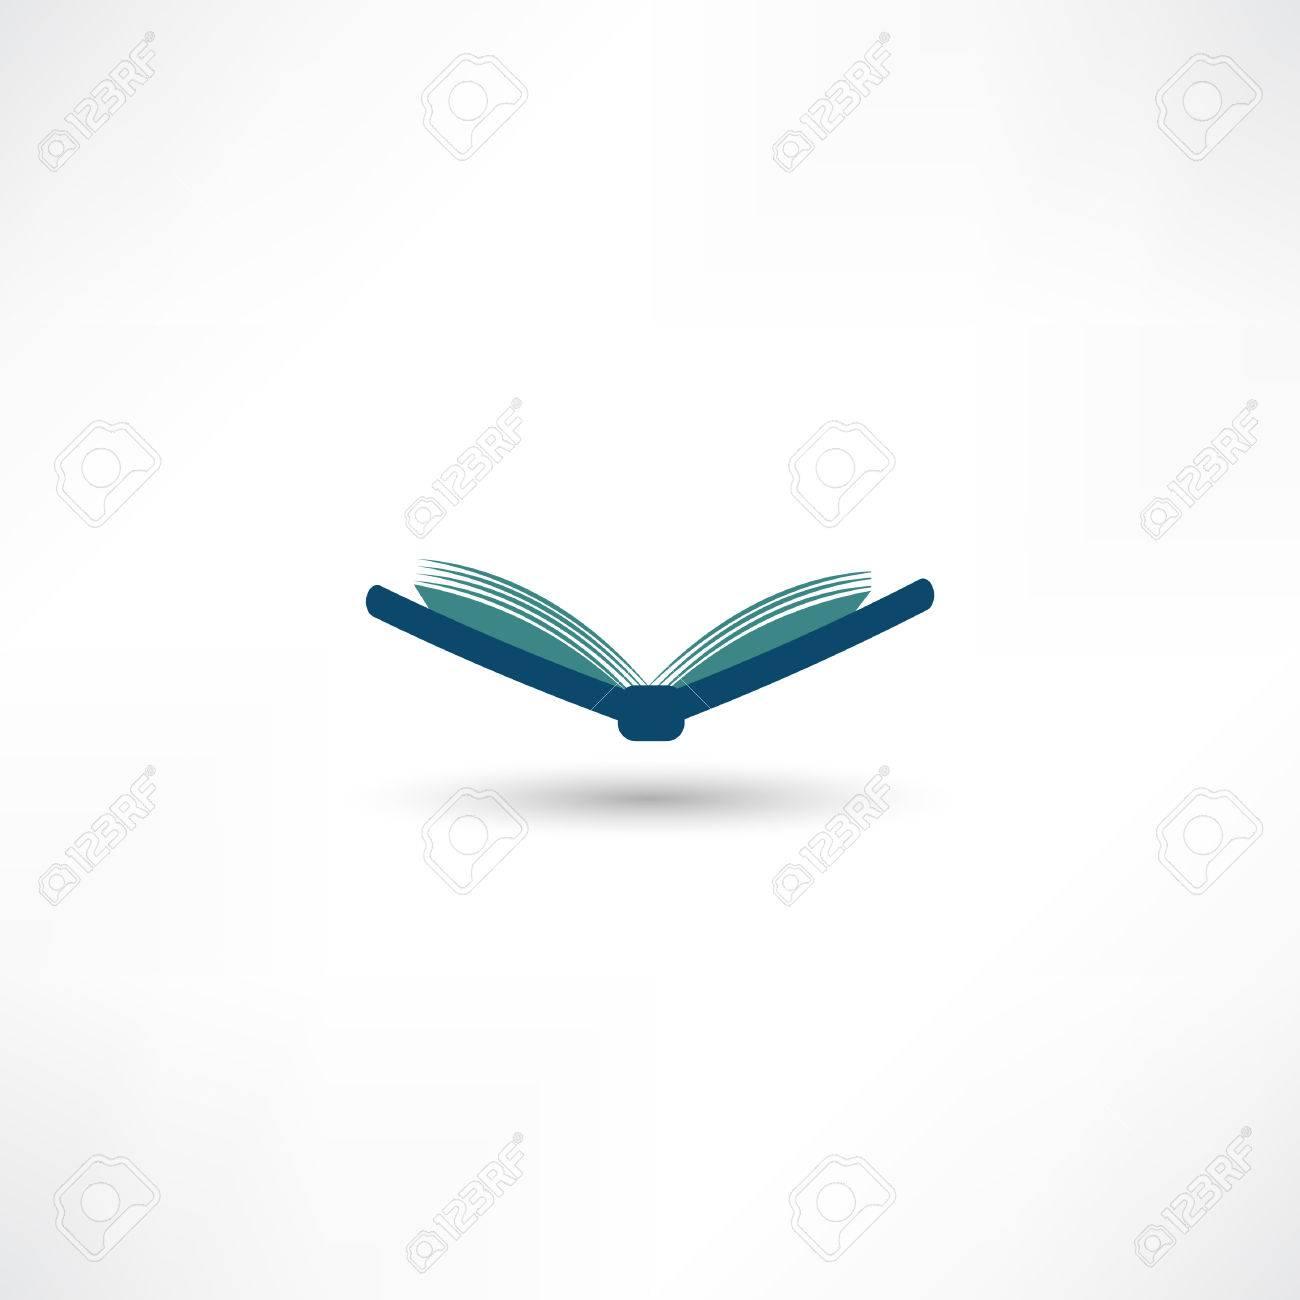 book icon Standard-Bild - 32204519